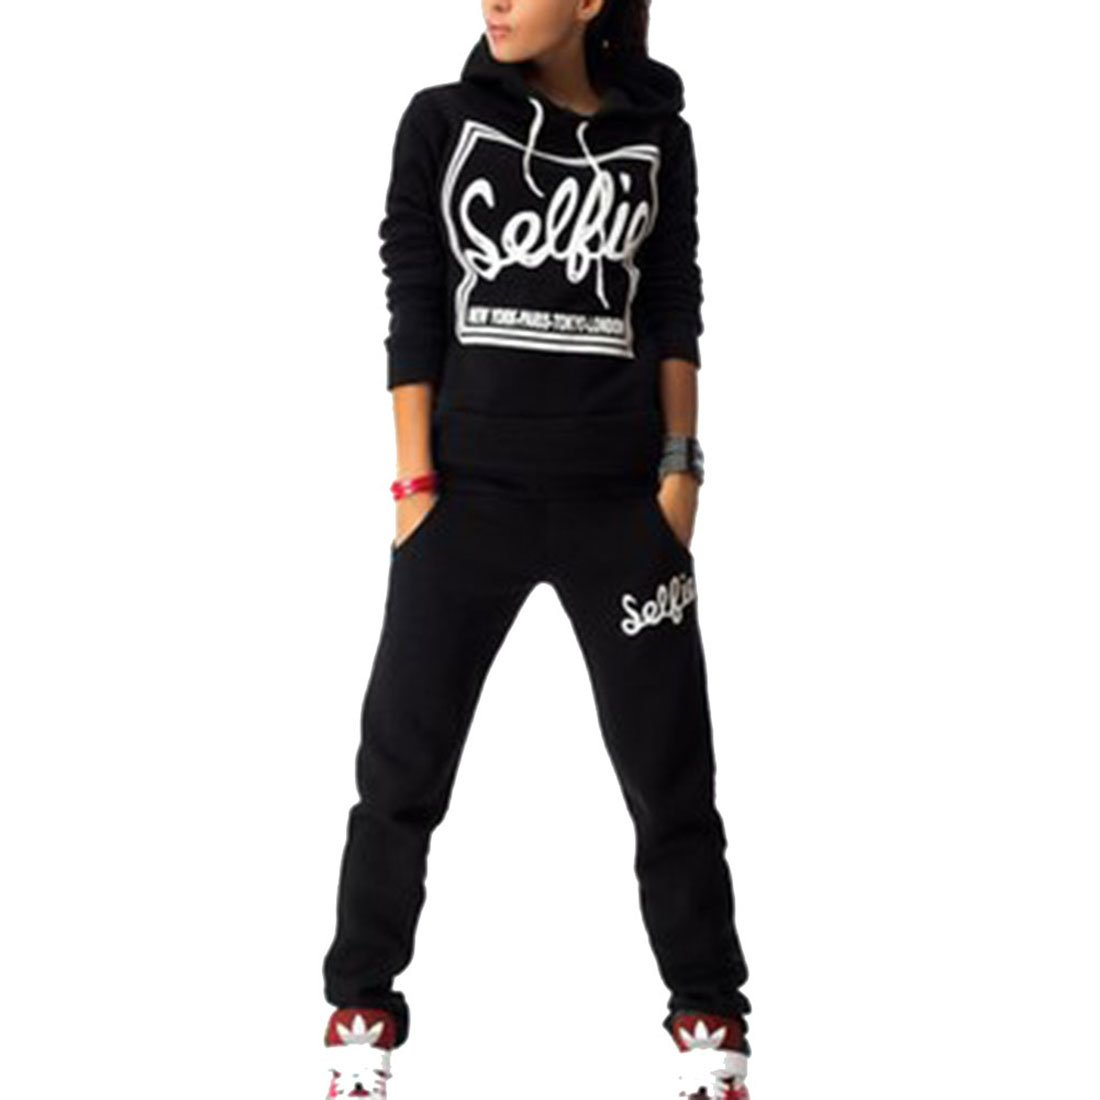 Sweatsuit Women Sports Long Sleeve Pullover Sweatshirt Hoodie SweatPants 2 Pieces Set Tracksuit Outfits